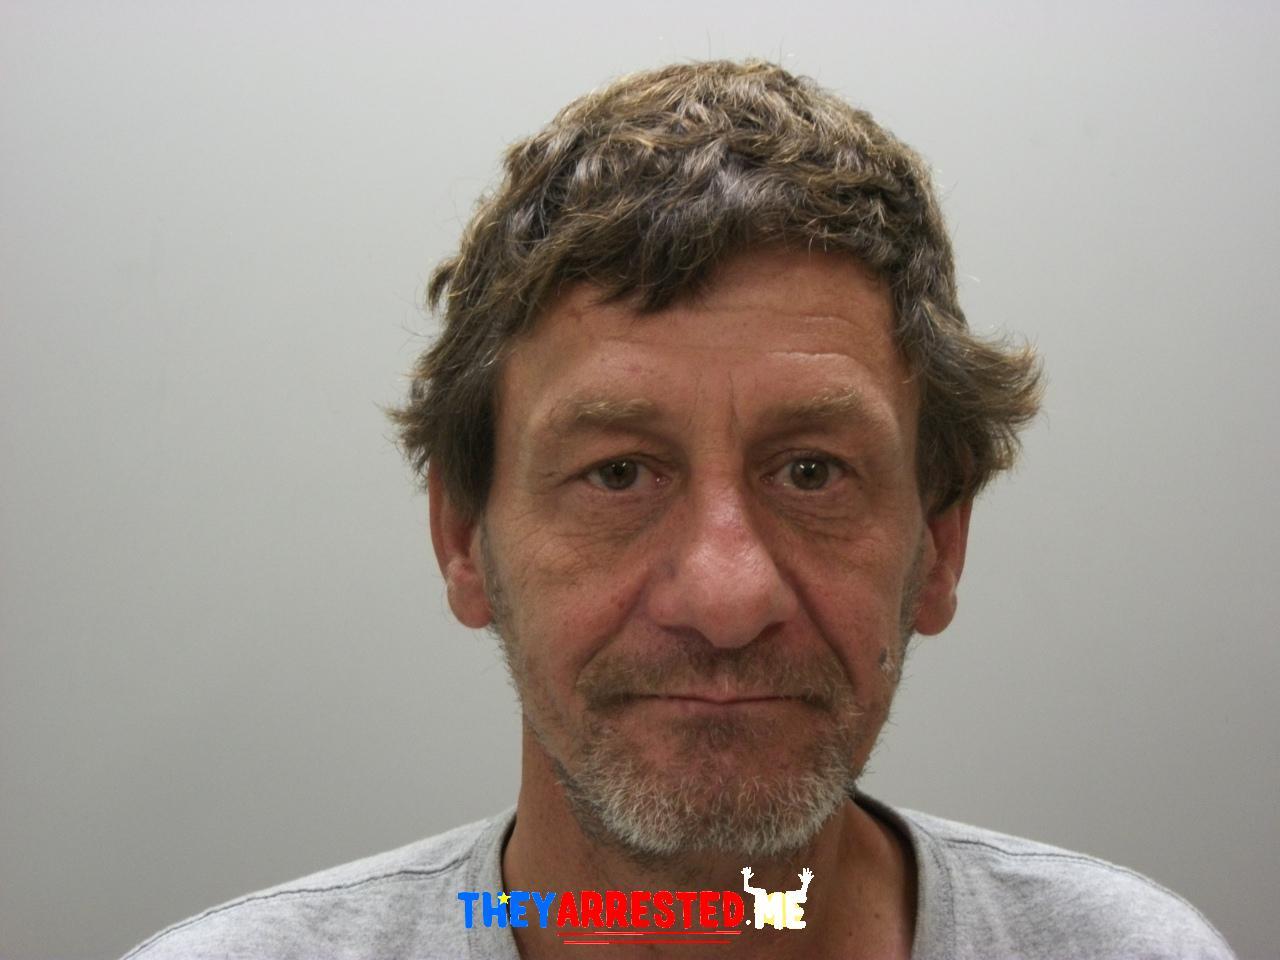 JOHN-BRENNAN-MONAGHAN (WCSO)